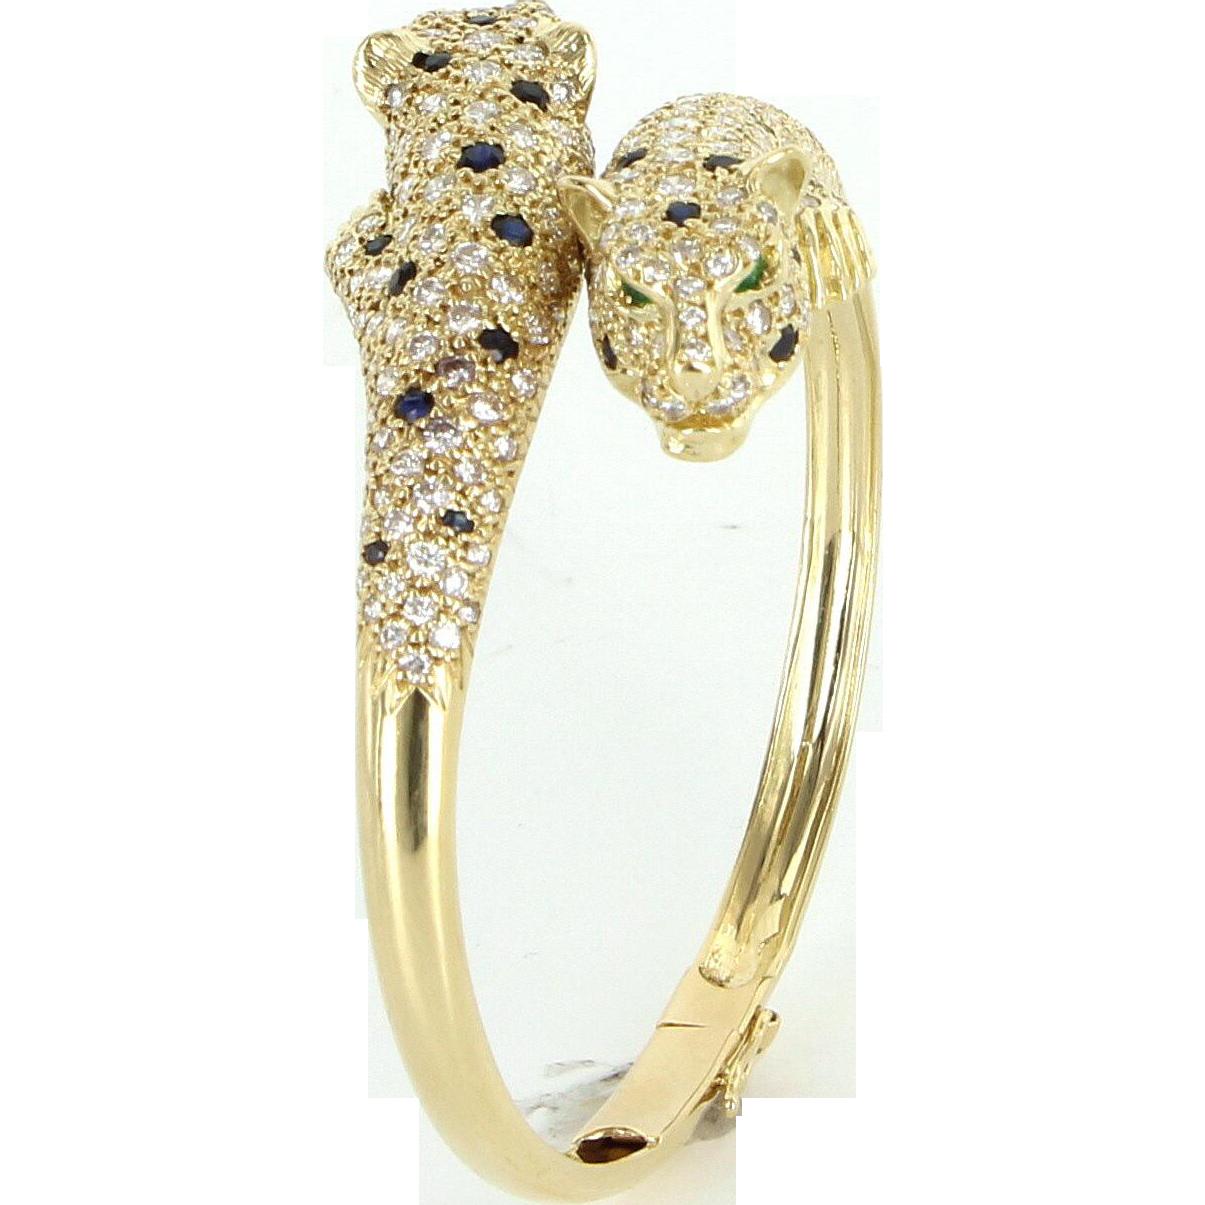 French Hallmarked Leopard Cat 18 Karat Gold Vintage Bangle Bracelet Animal Jewelry